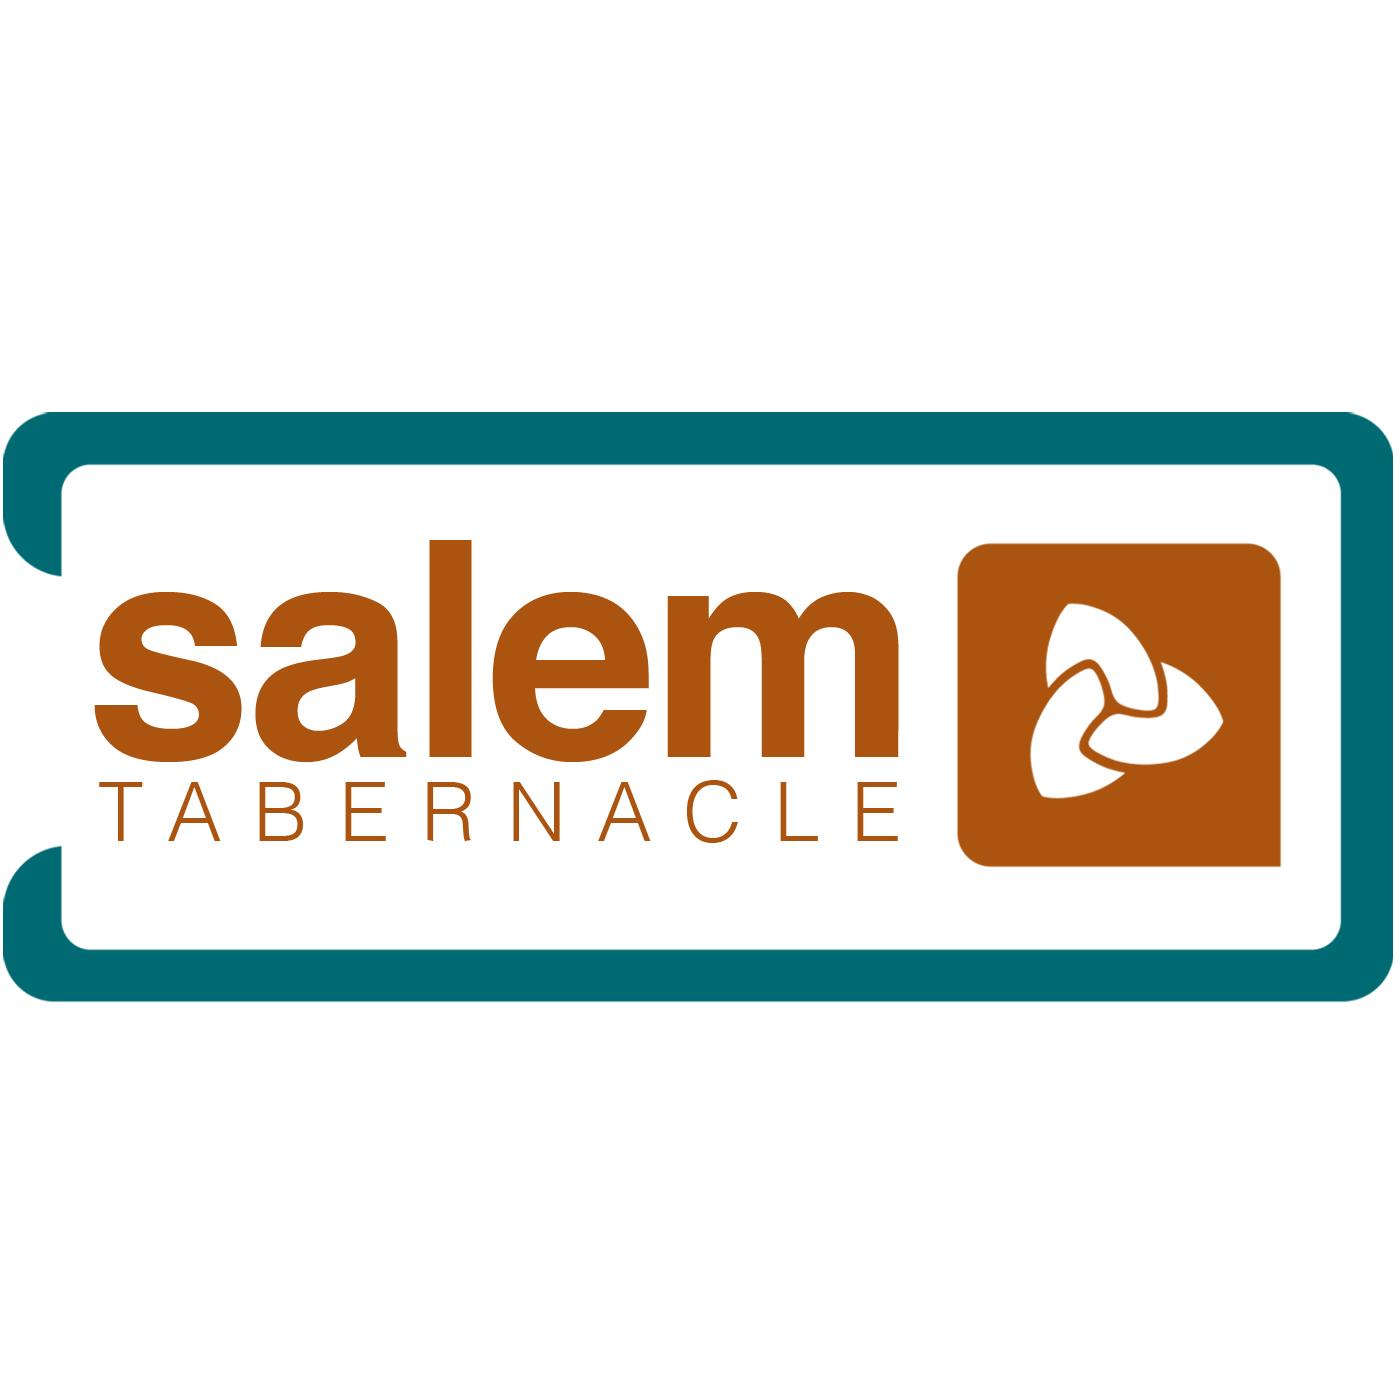 Salem Tabernacle